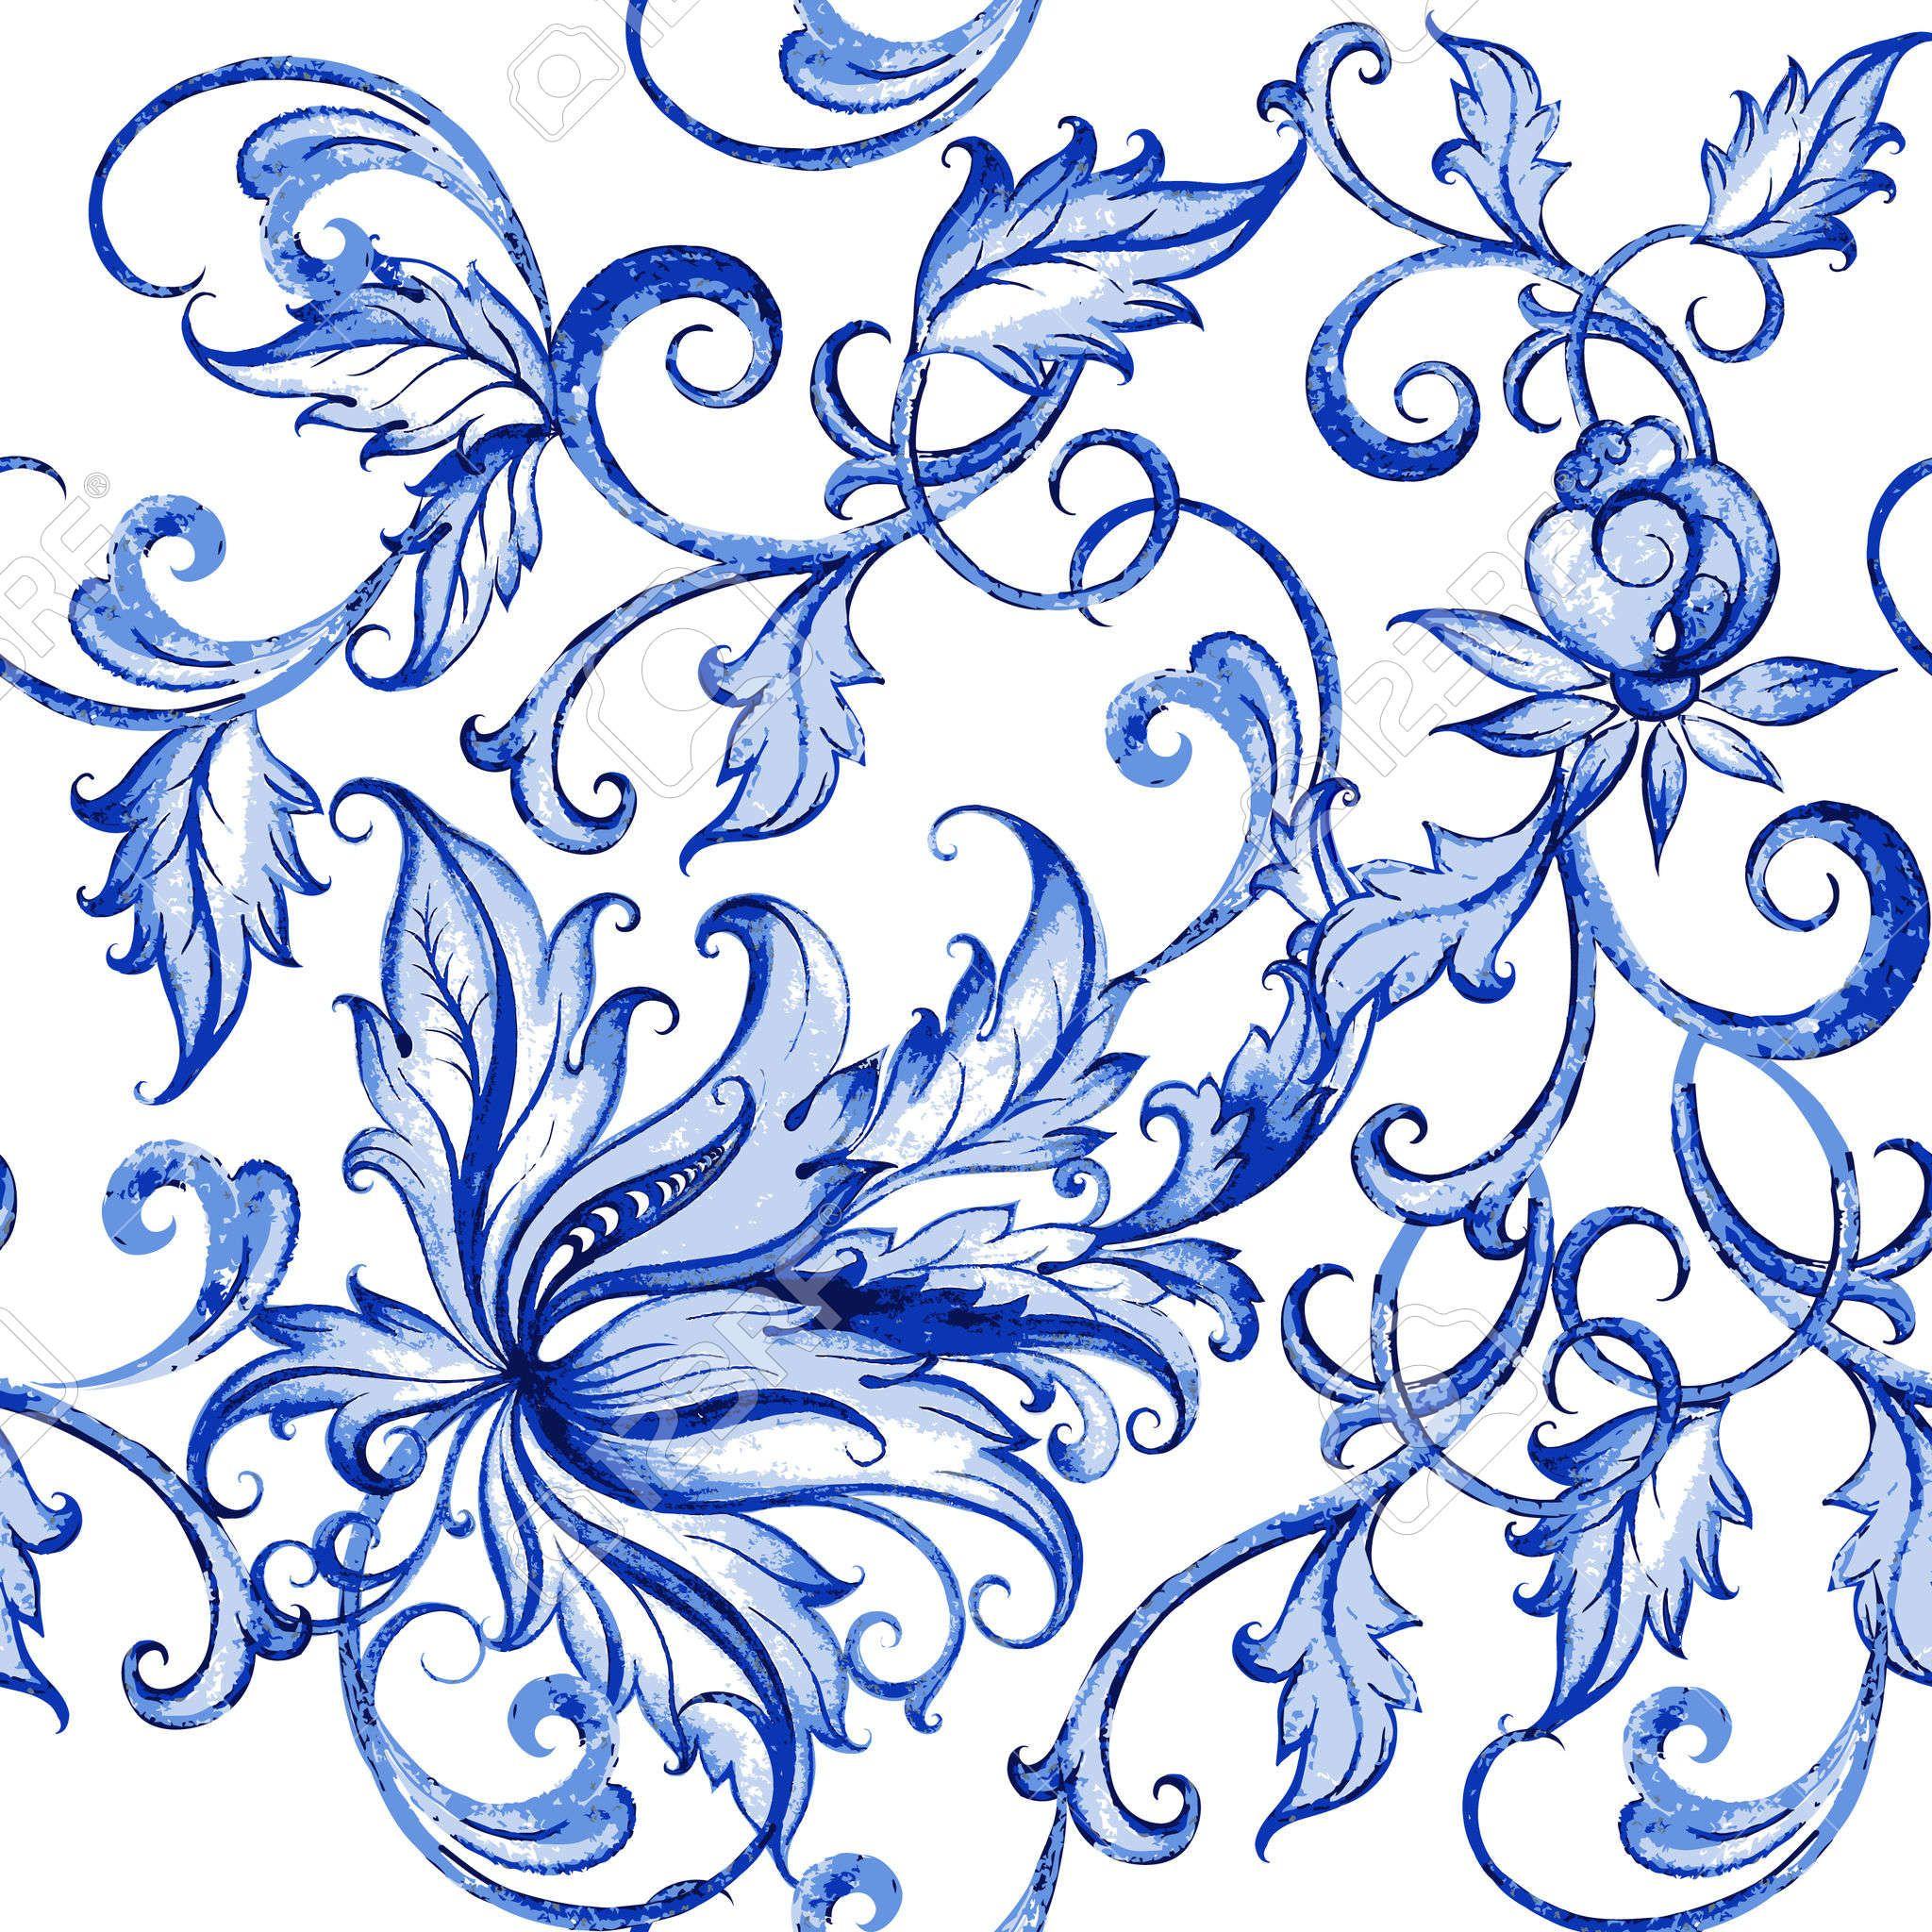 vector acquarello floreale texture con flowerswatercolor